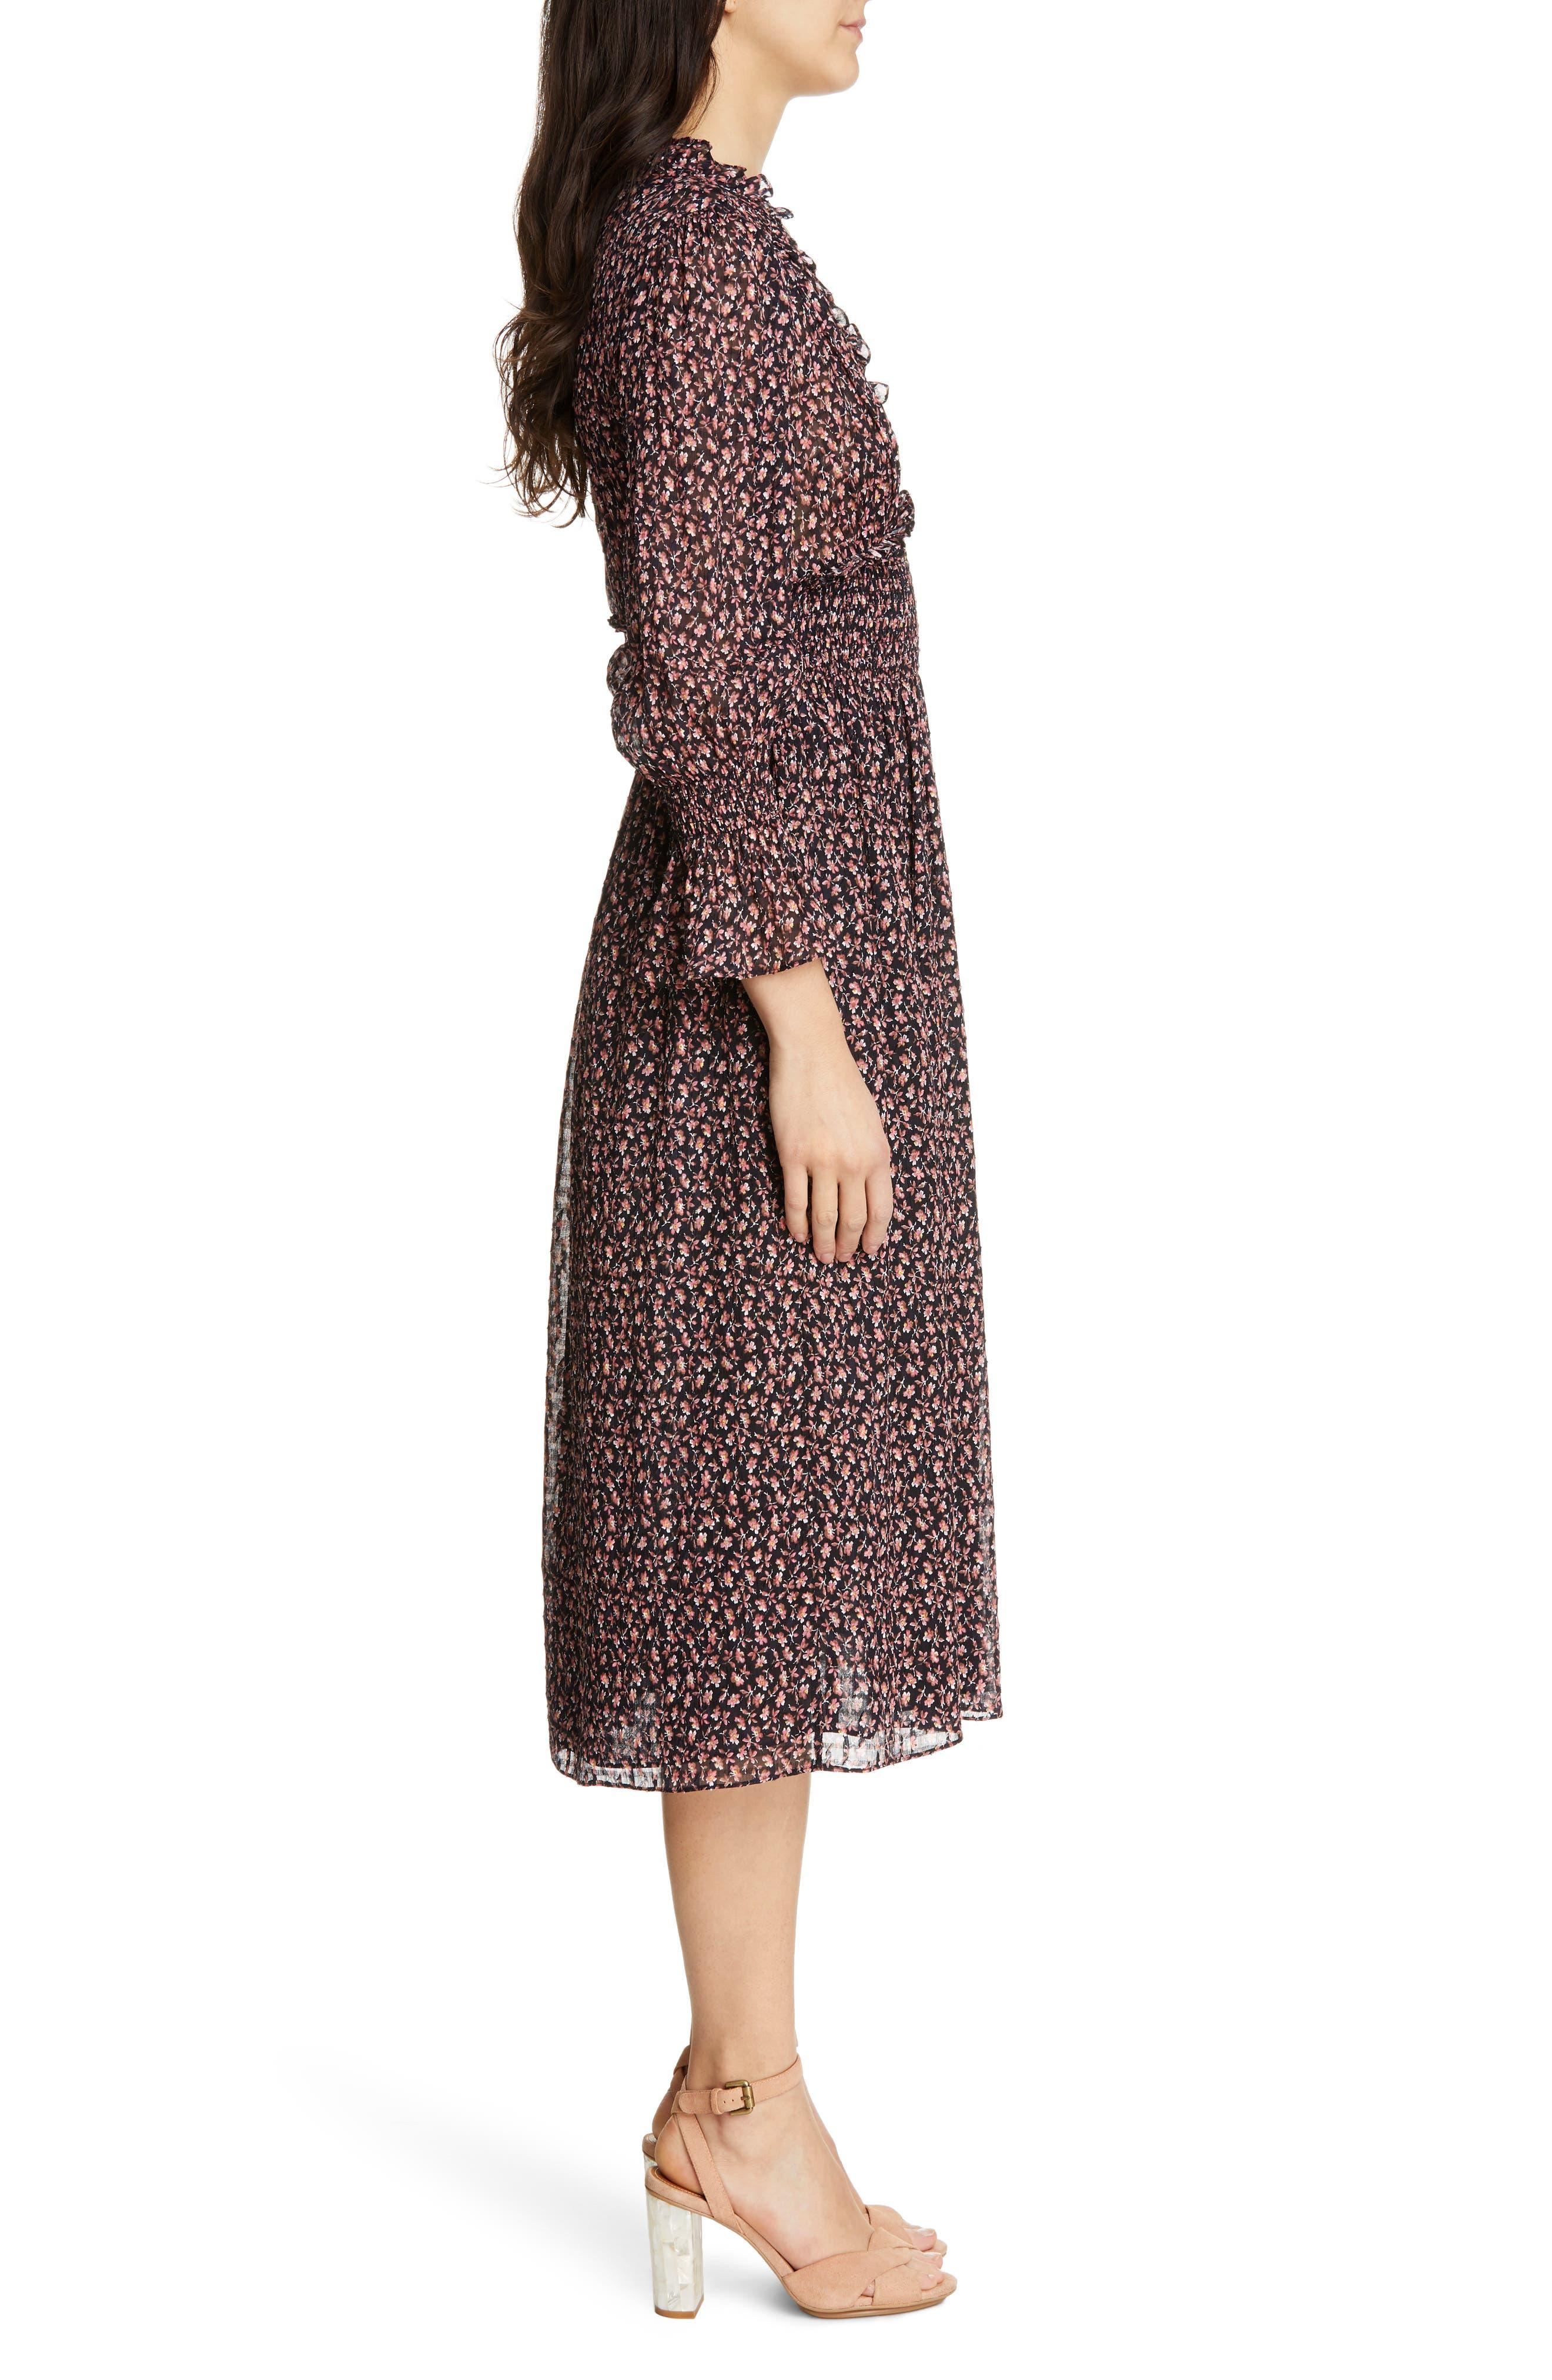 REBECCA TAYLOR, Floral Smock Detail Long Sleeve Silk & Cotton Dress, Alternate thumbnail 3, color, NAVY COMBO